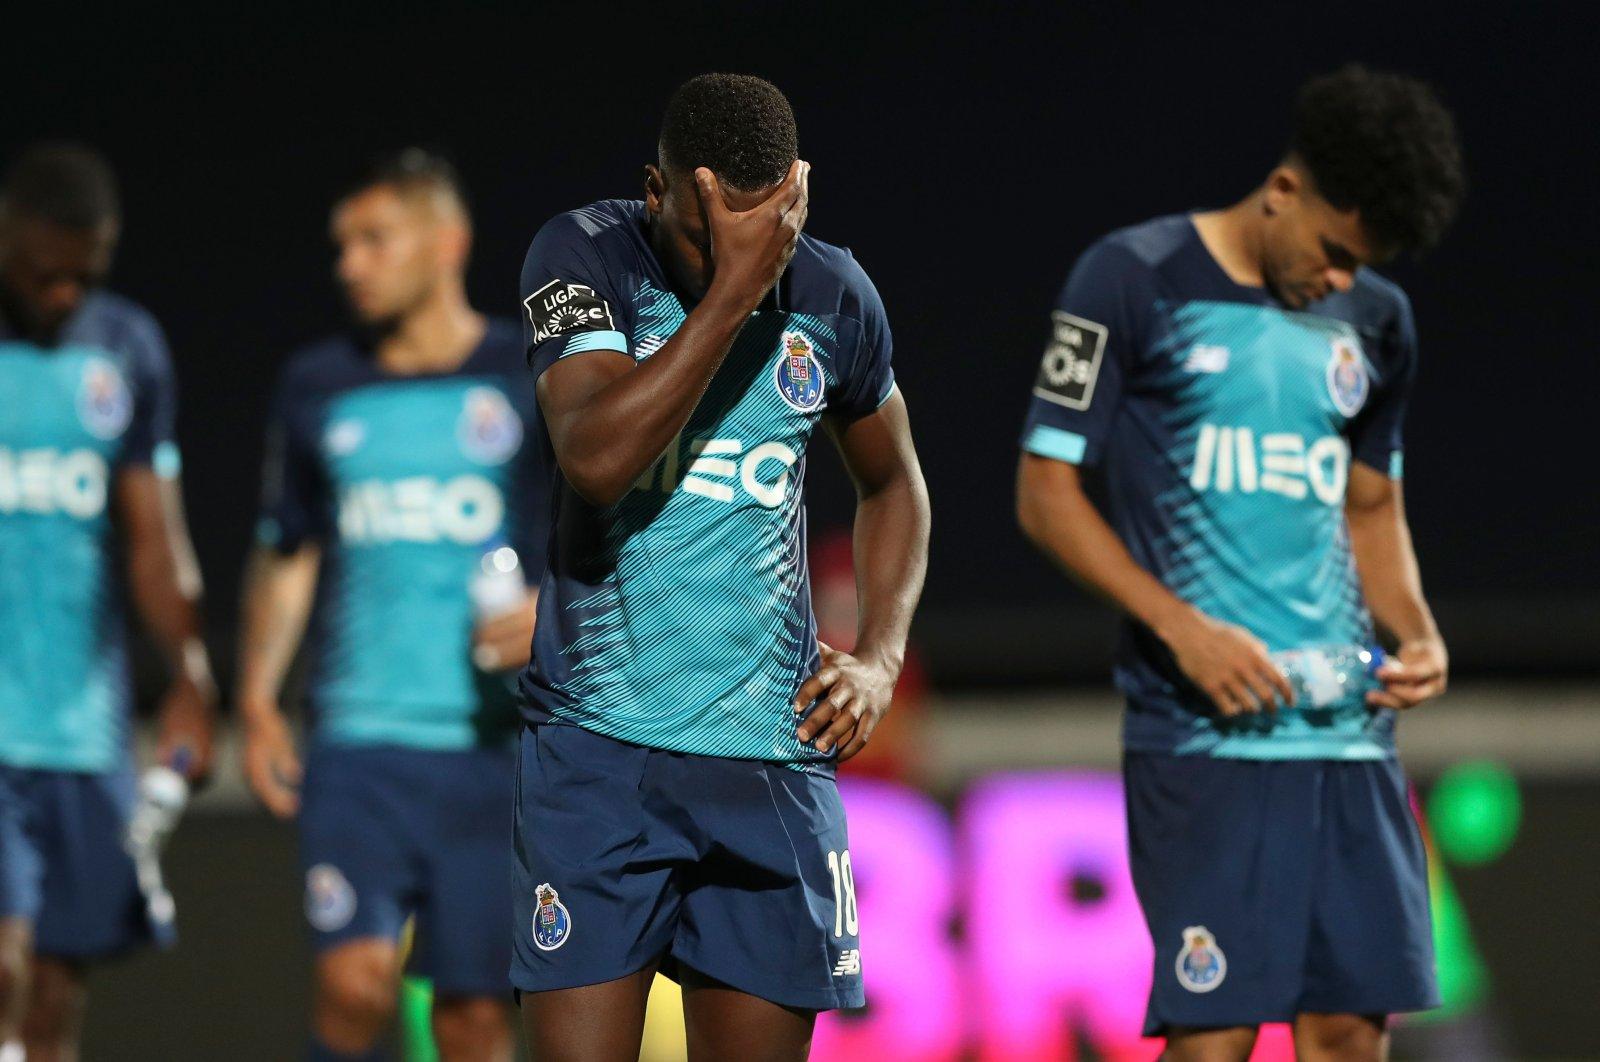 FC Porto's Wilson Manafa reacts after a match against FC Famalicao in Vila Nova de Famalicao, Portugal, June 3, 2020. (AFP Photo)